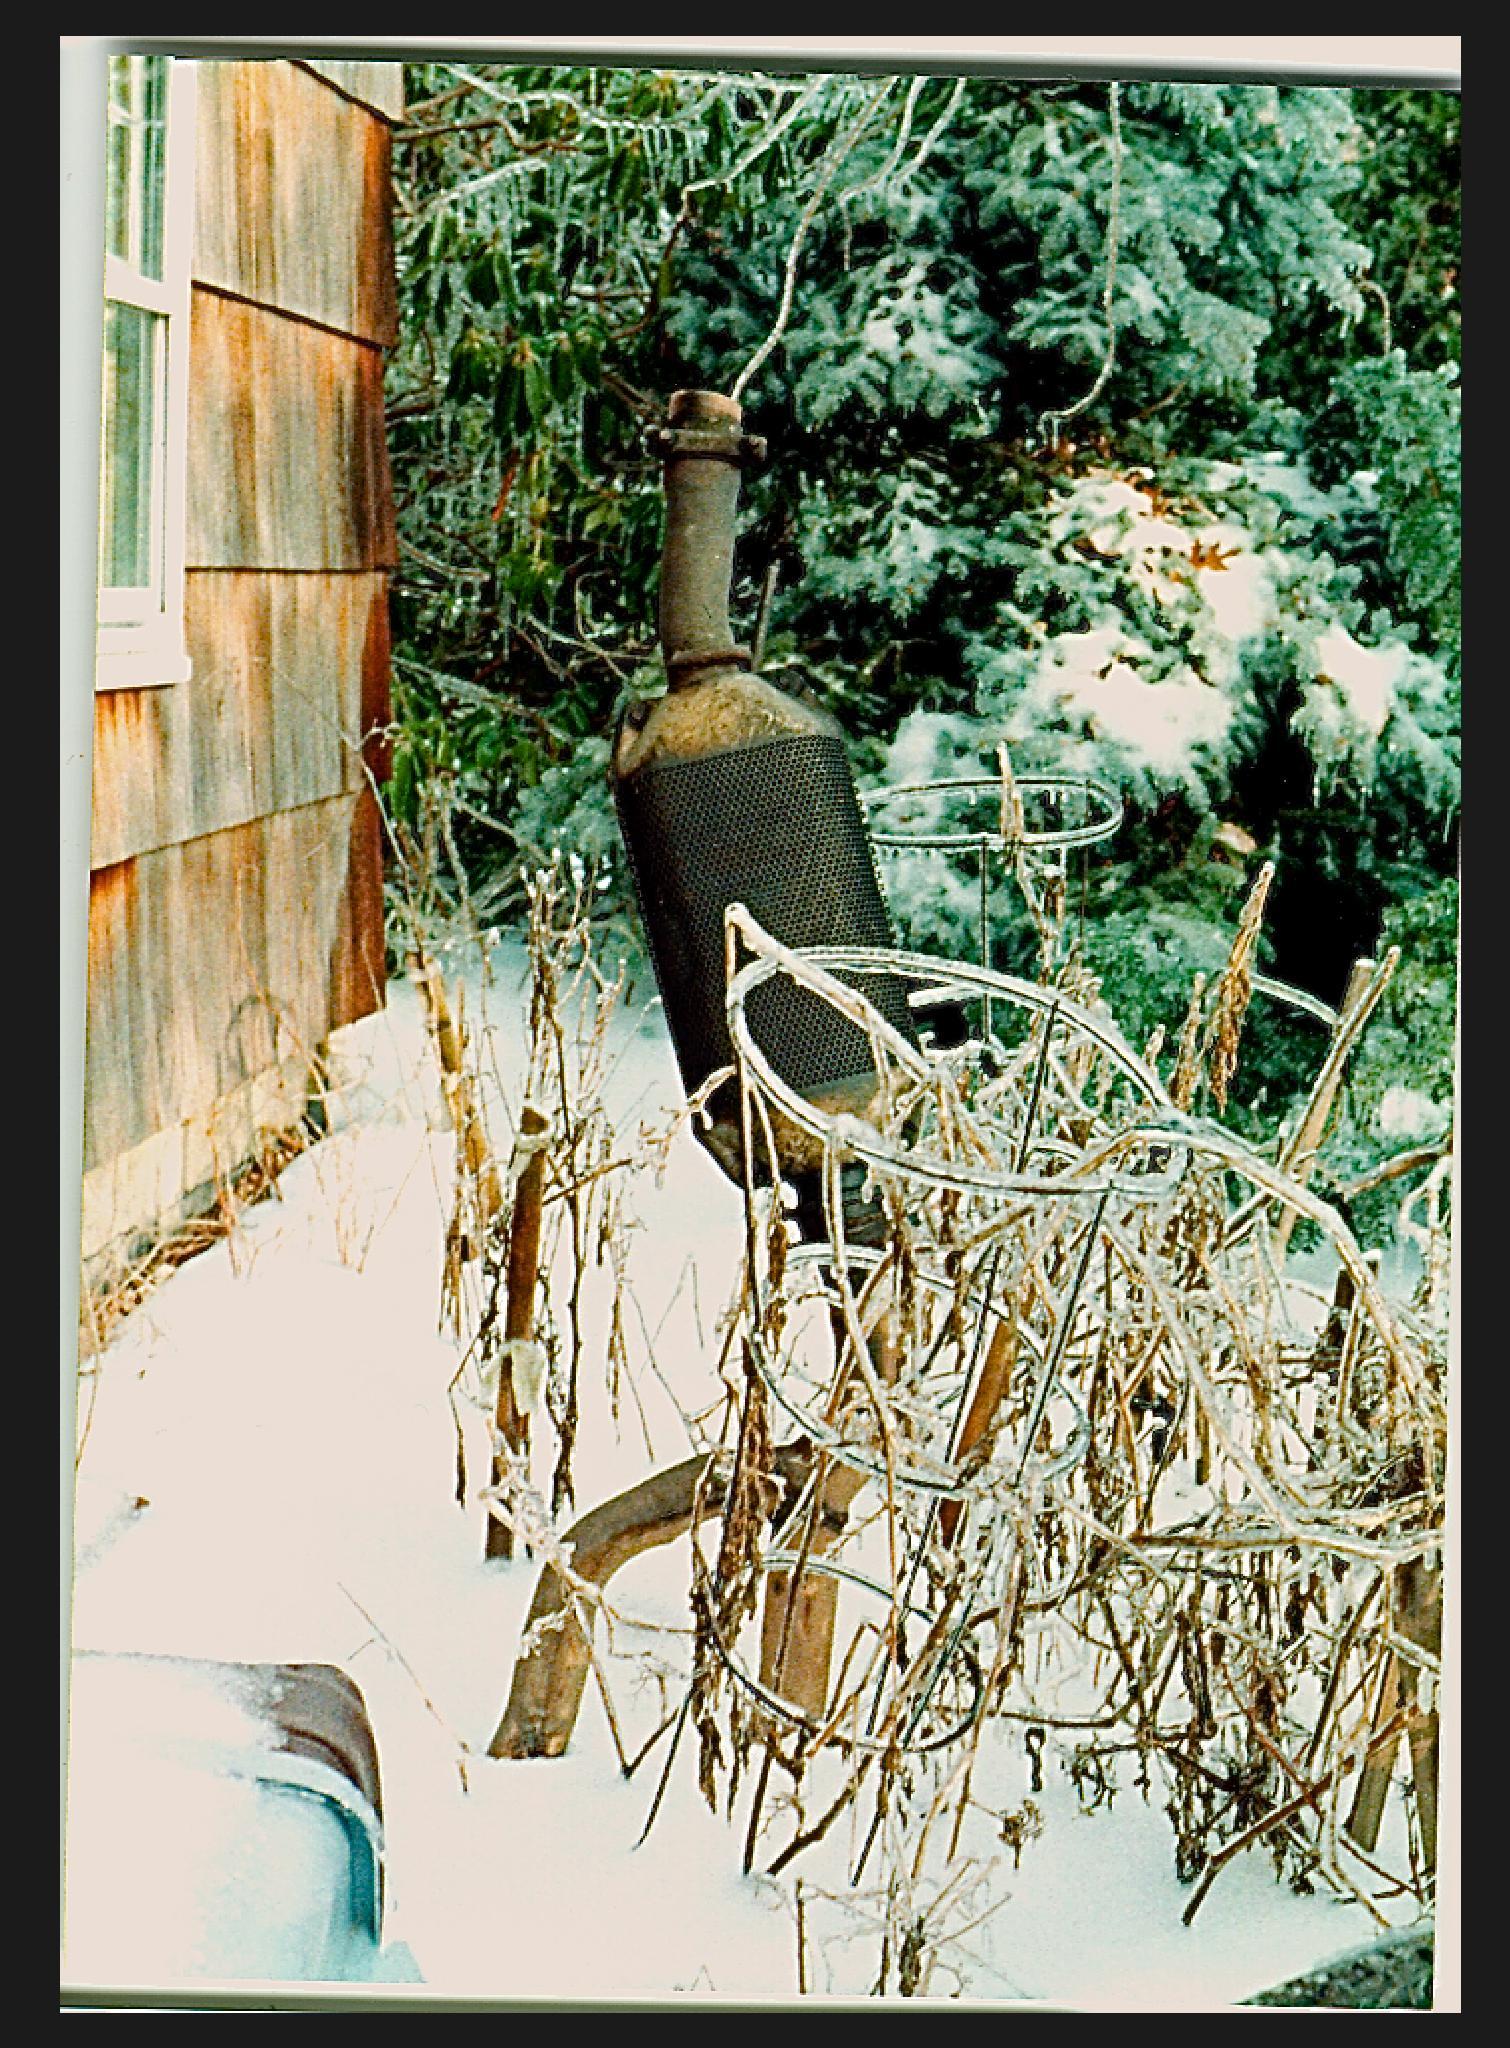 Frozen Exhaust Creature by John Tabacco